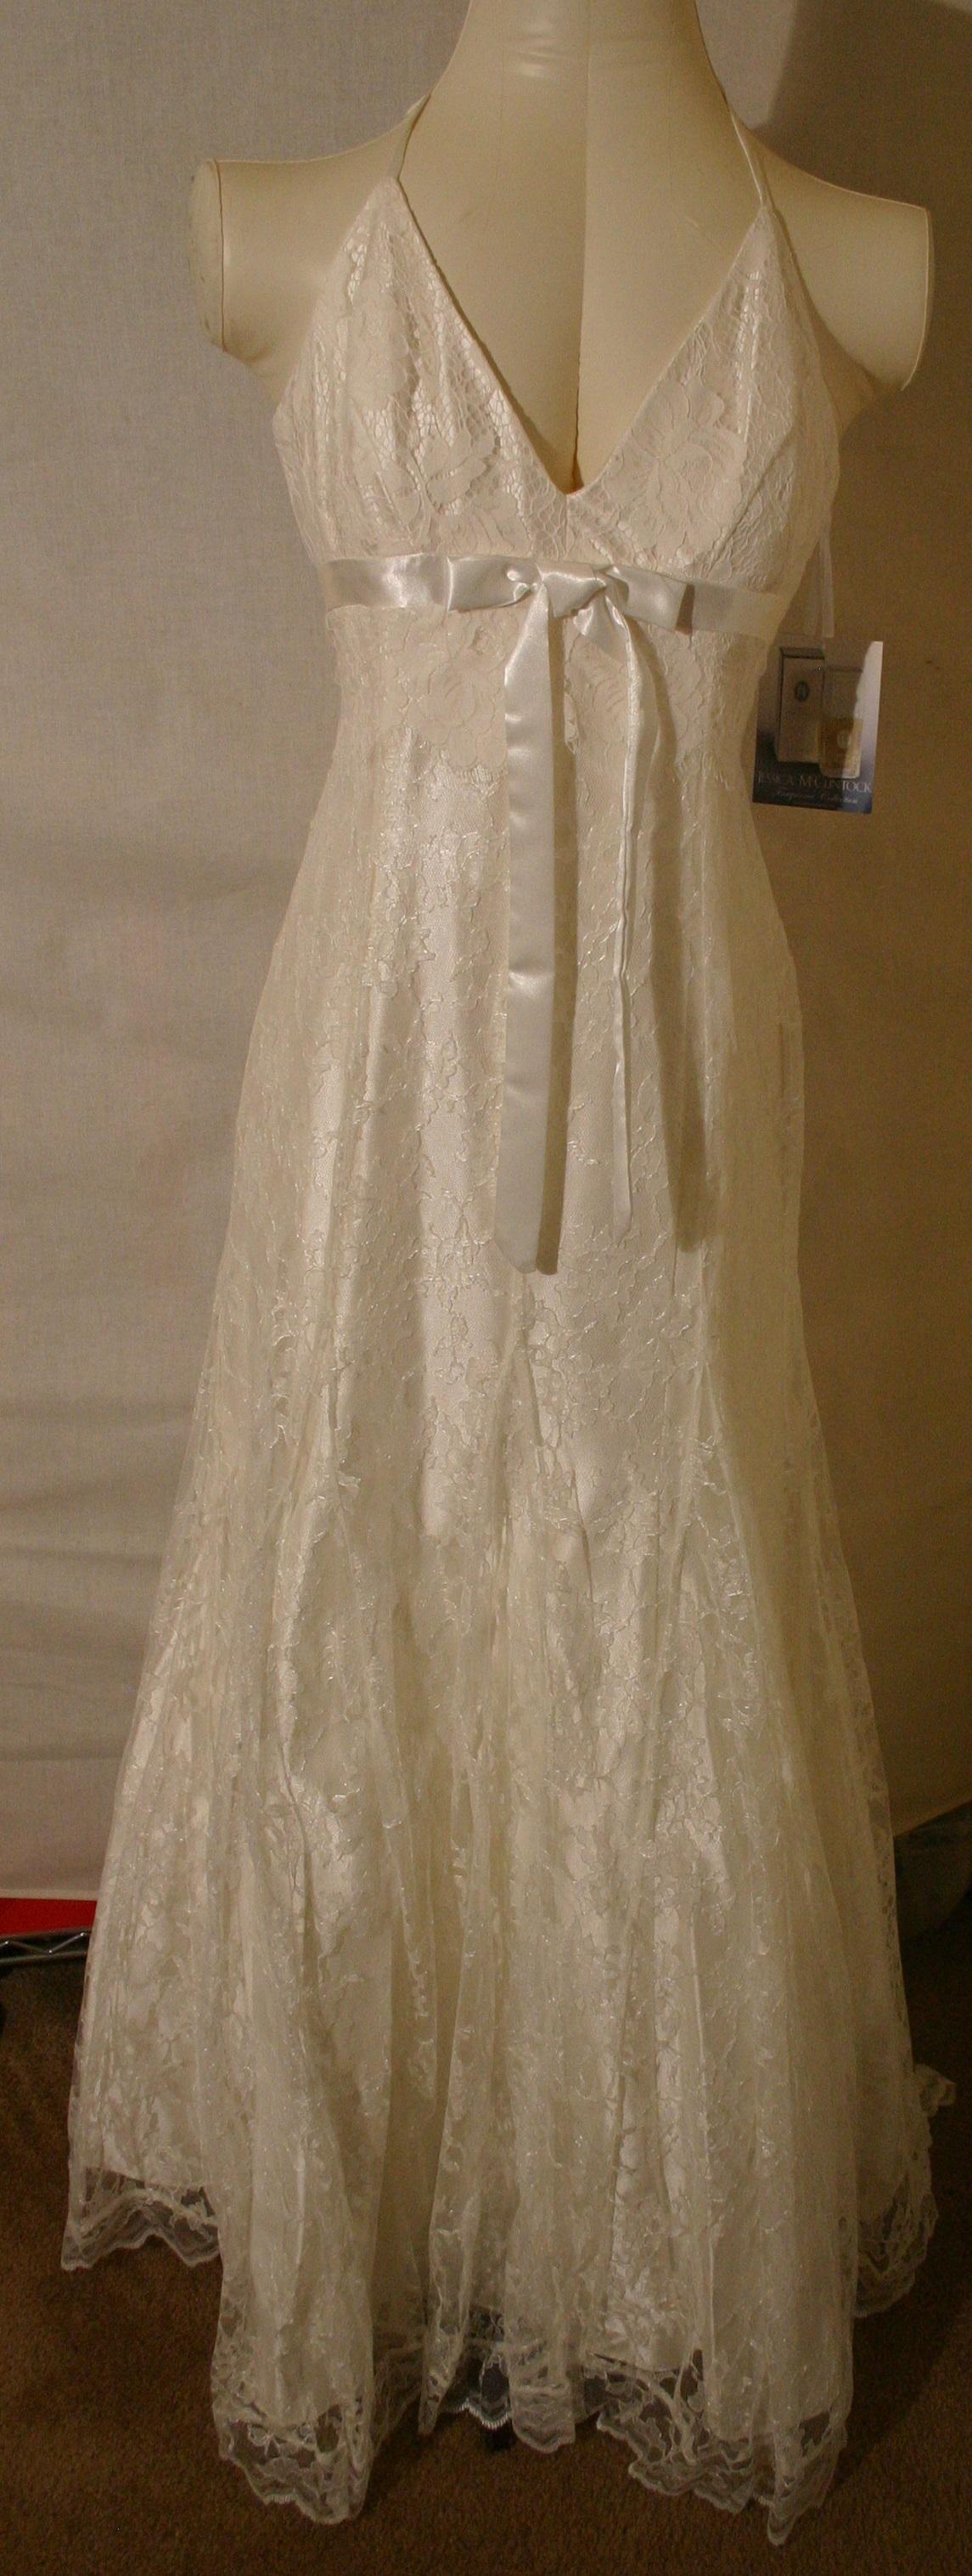 JESSICA McCLINTOCK Beige Dress Gown NWT Size 4 6 8 10